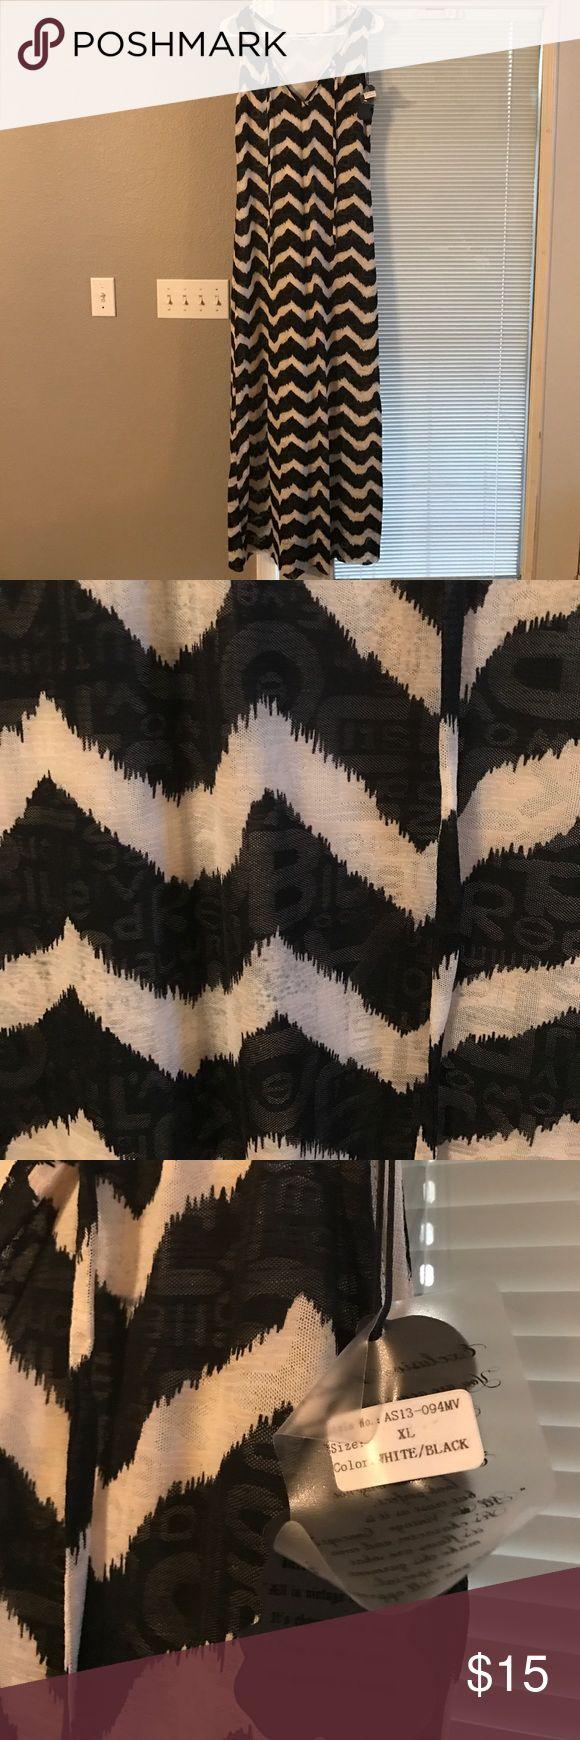 Black & White Chevron Print Maxi Dress XL Maxi Dress chevron black and white. Brand New with Tags Chevron print as letters on the fabric Dresses Maxi